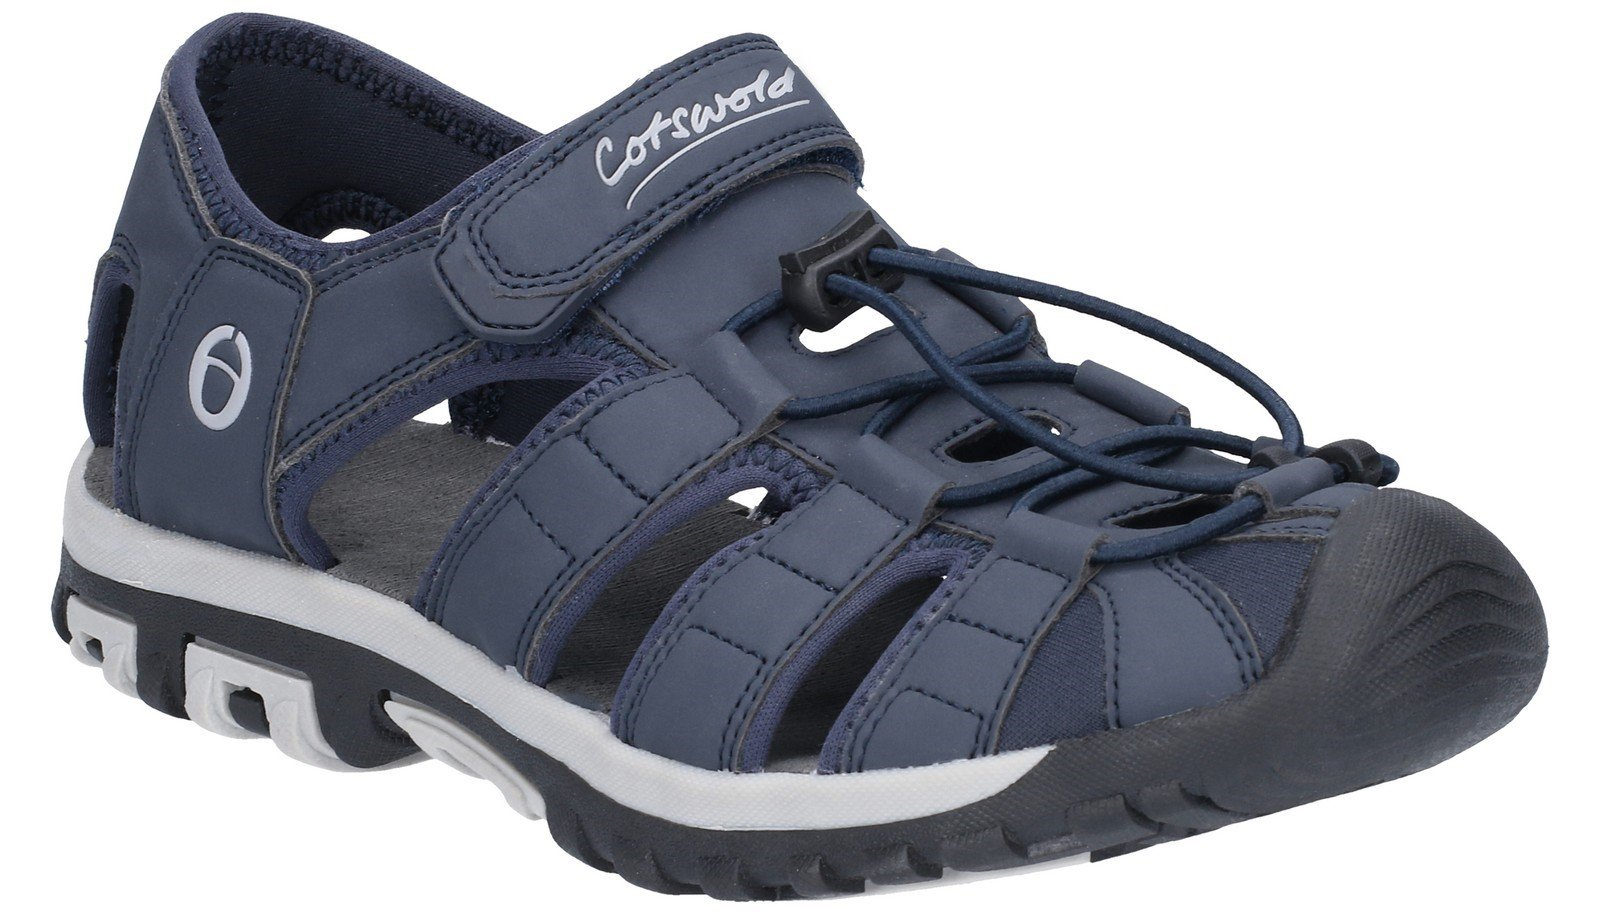 Cotswold Men's Tormarton Closed Toe Fisherman Walking Sandal Blue 28232 - Blue 6